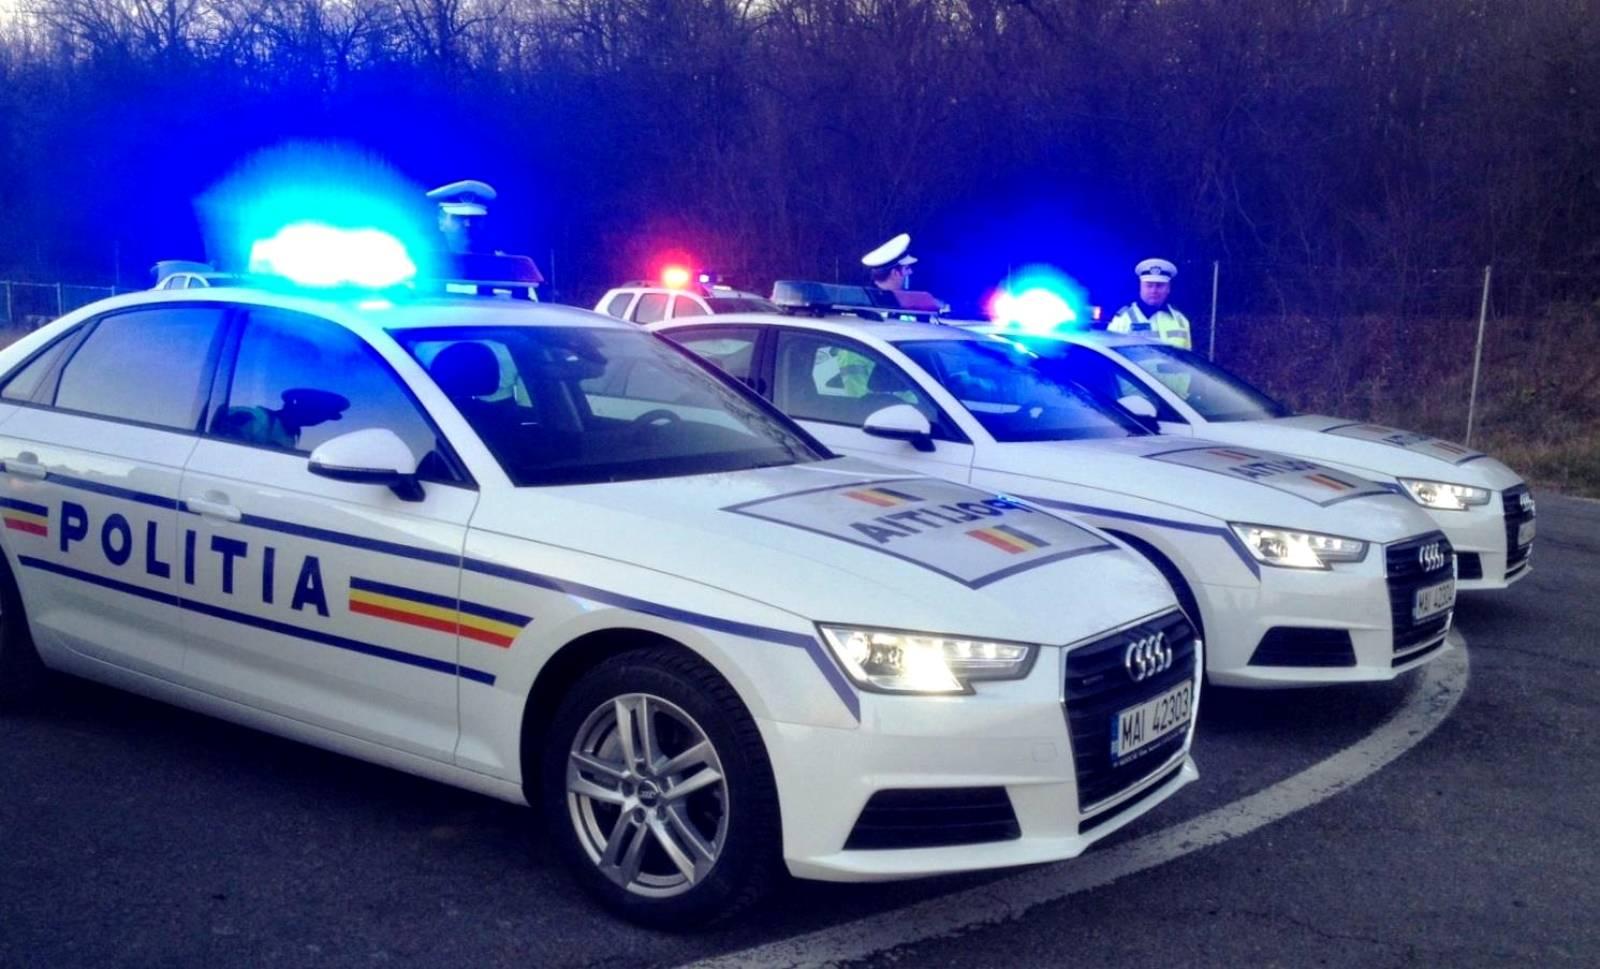 Politia Romana amenzi nerespectare masuri